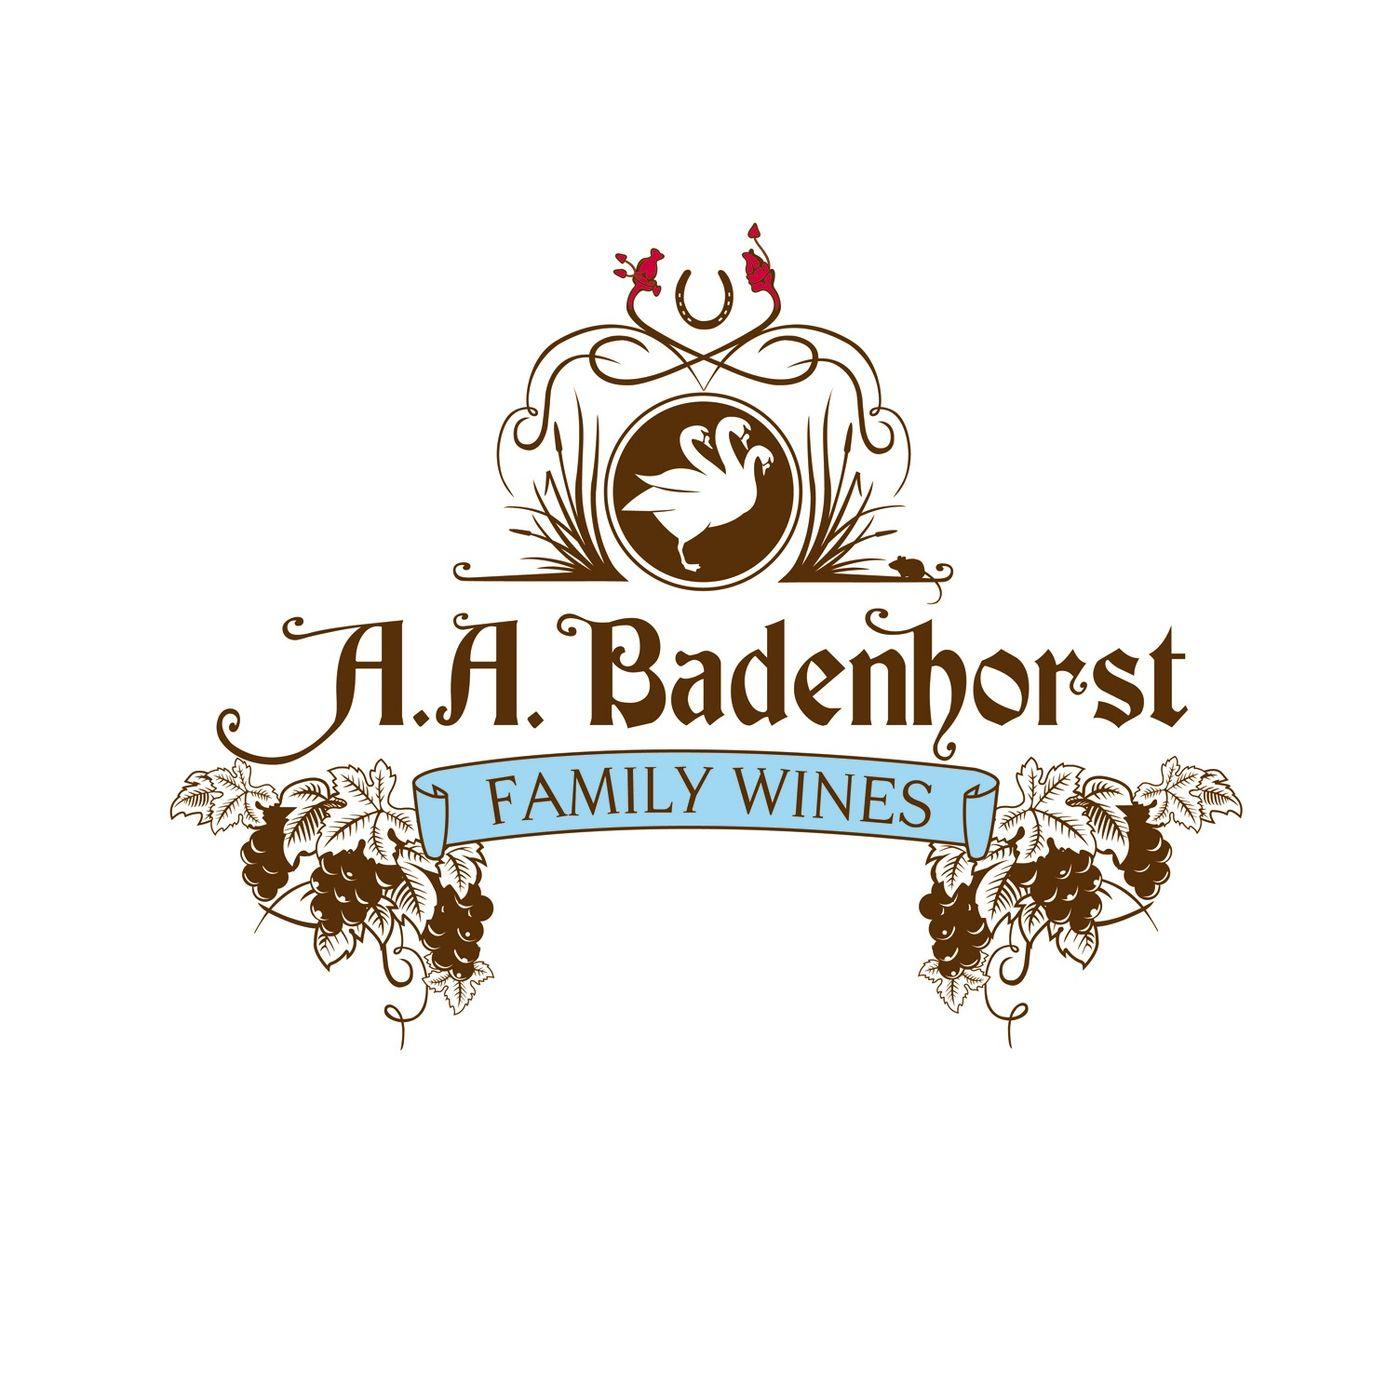 South Africa - AA Badenhorst - Adi Badenhorst